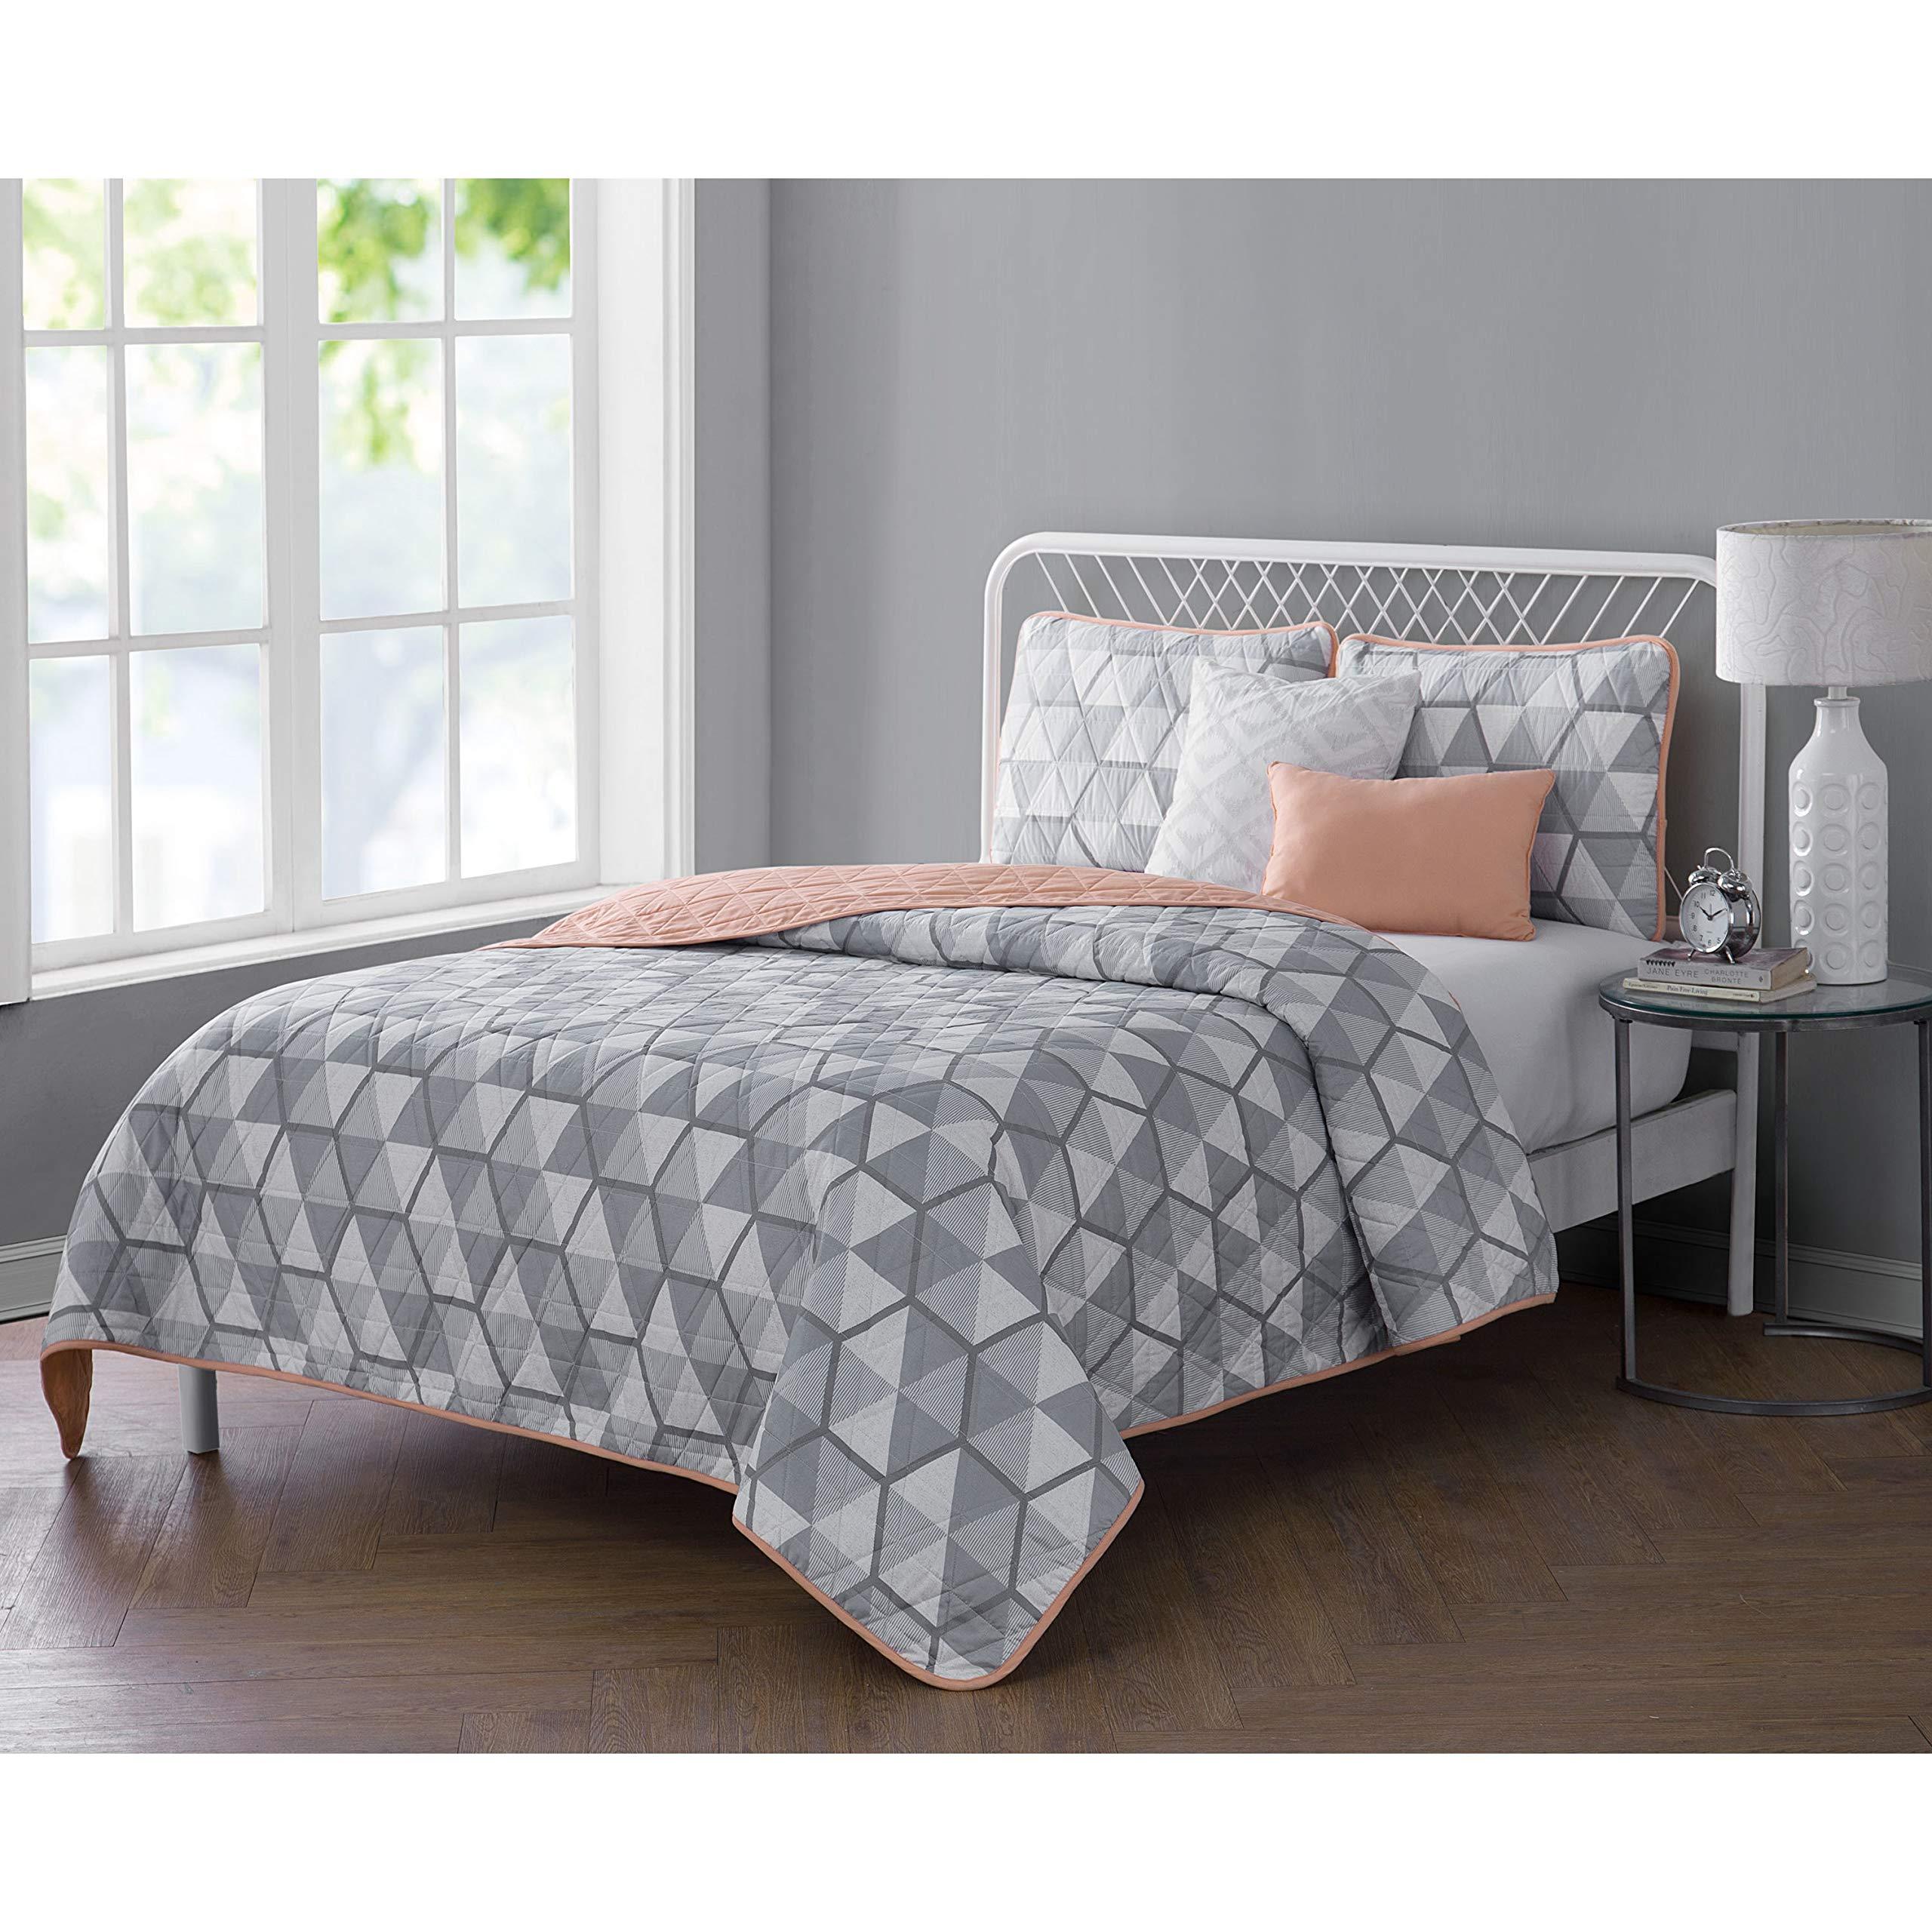 VCNY Home 5 Piece Reversible Bedding Quilt Set